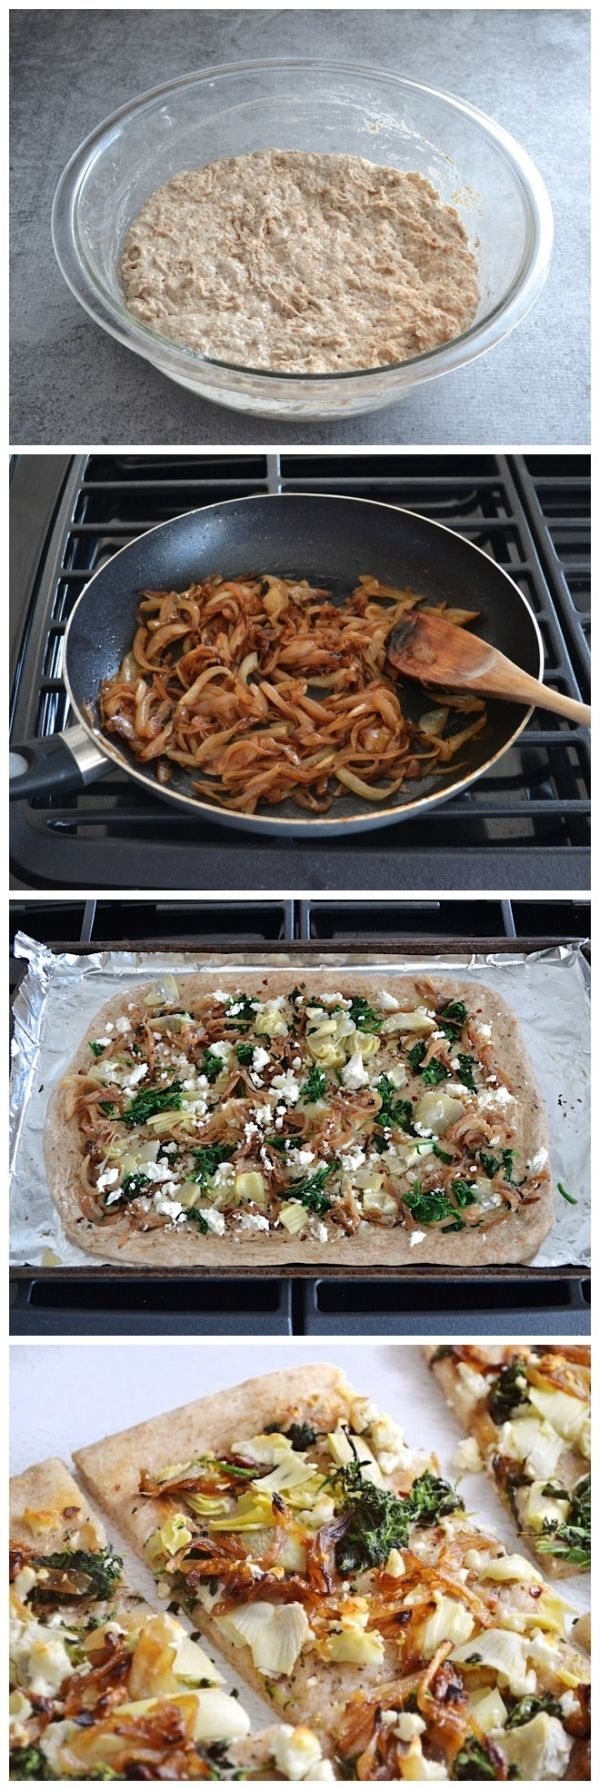 Caramelized Onion and Artichoke Flatbread